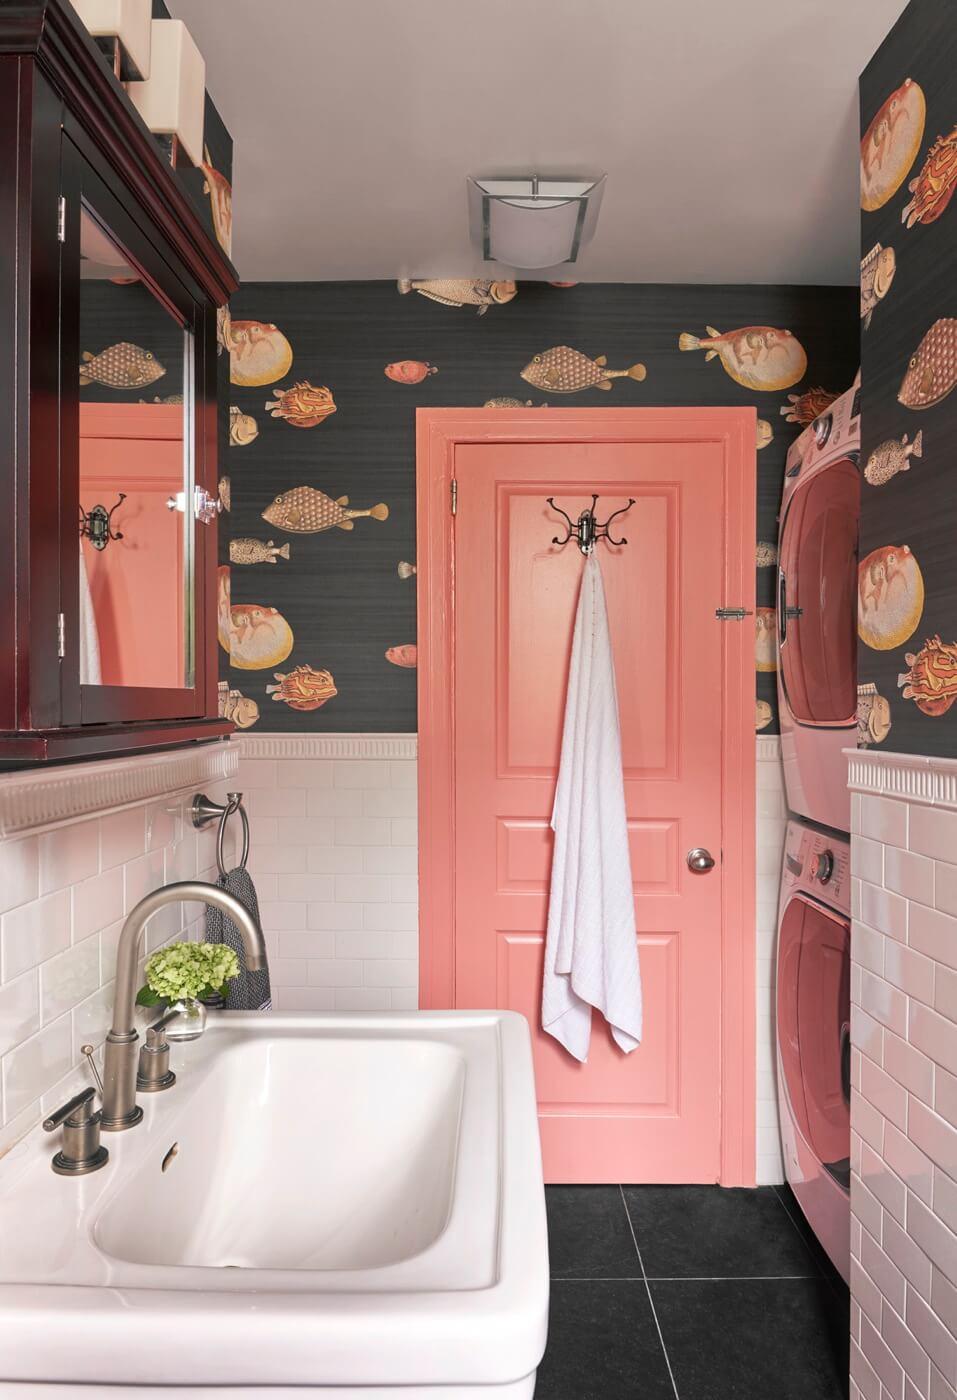 pantone-living-coral-interior-decor-14.jpg